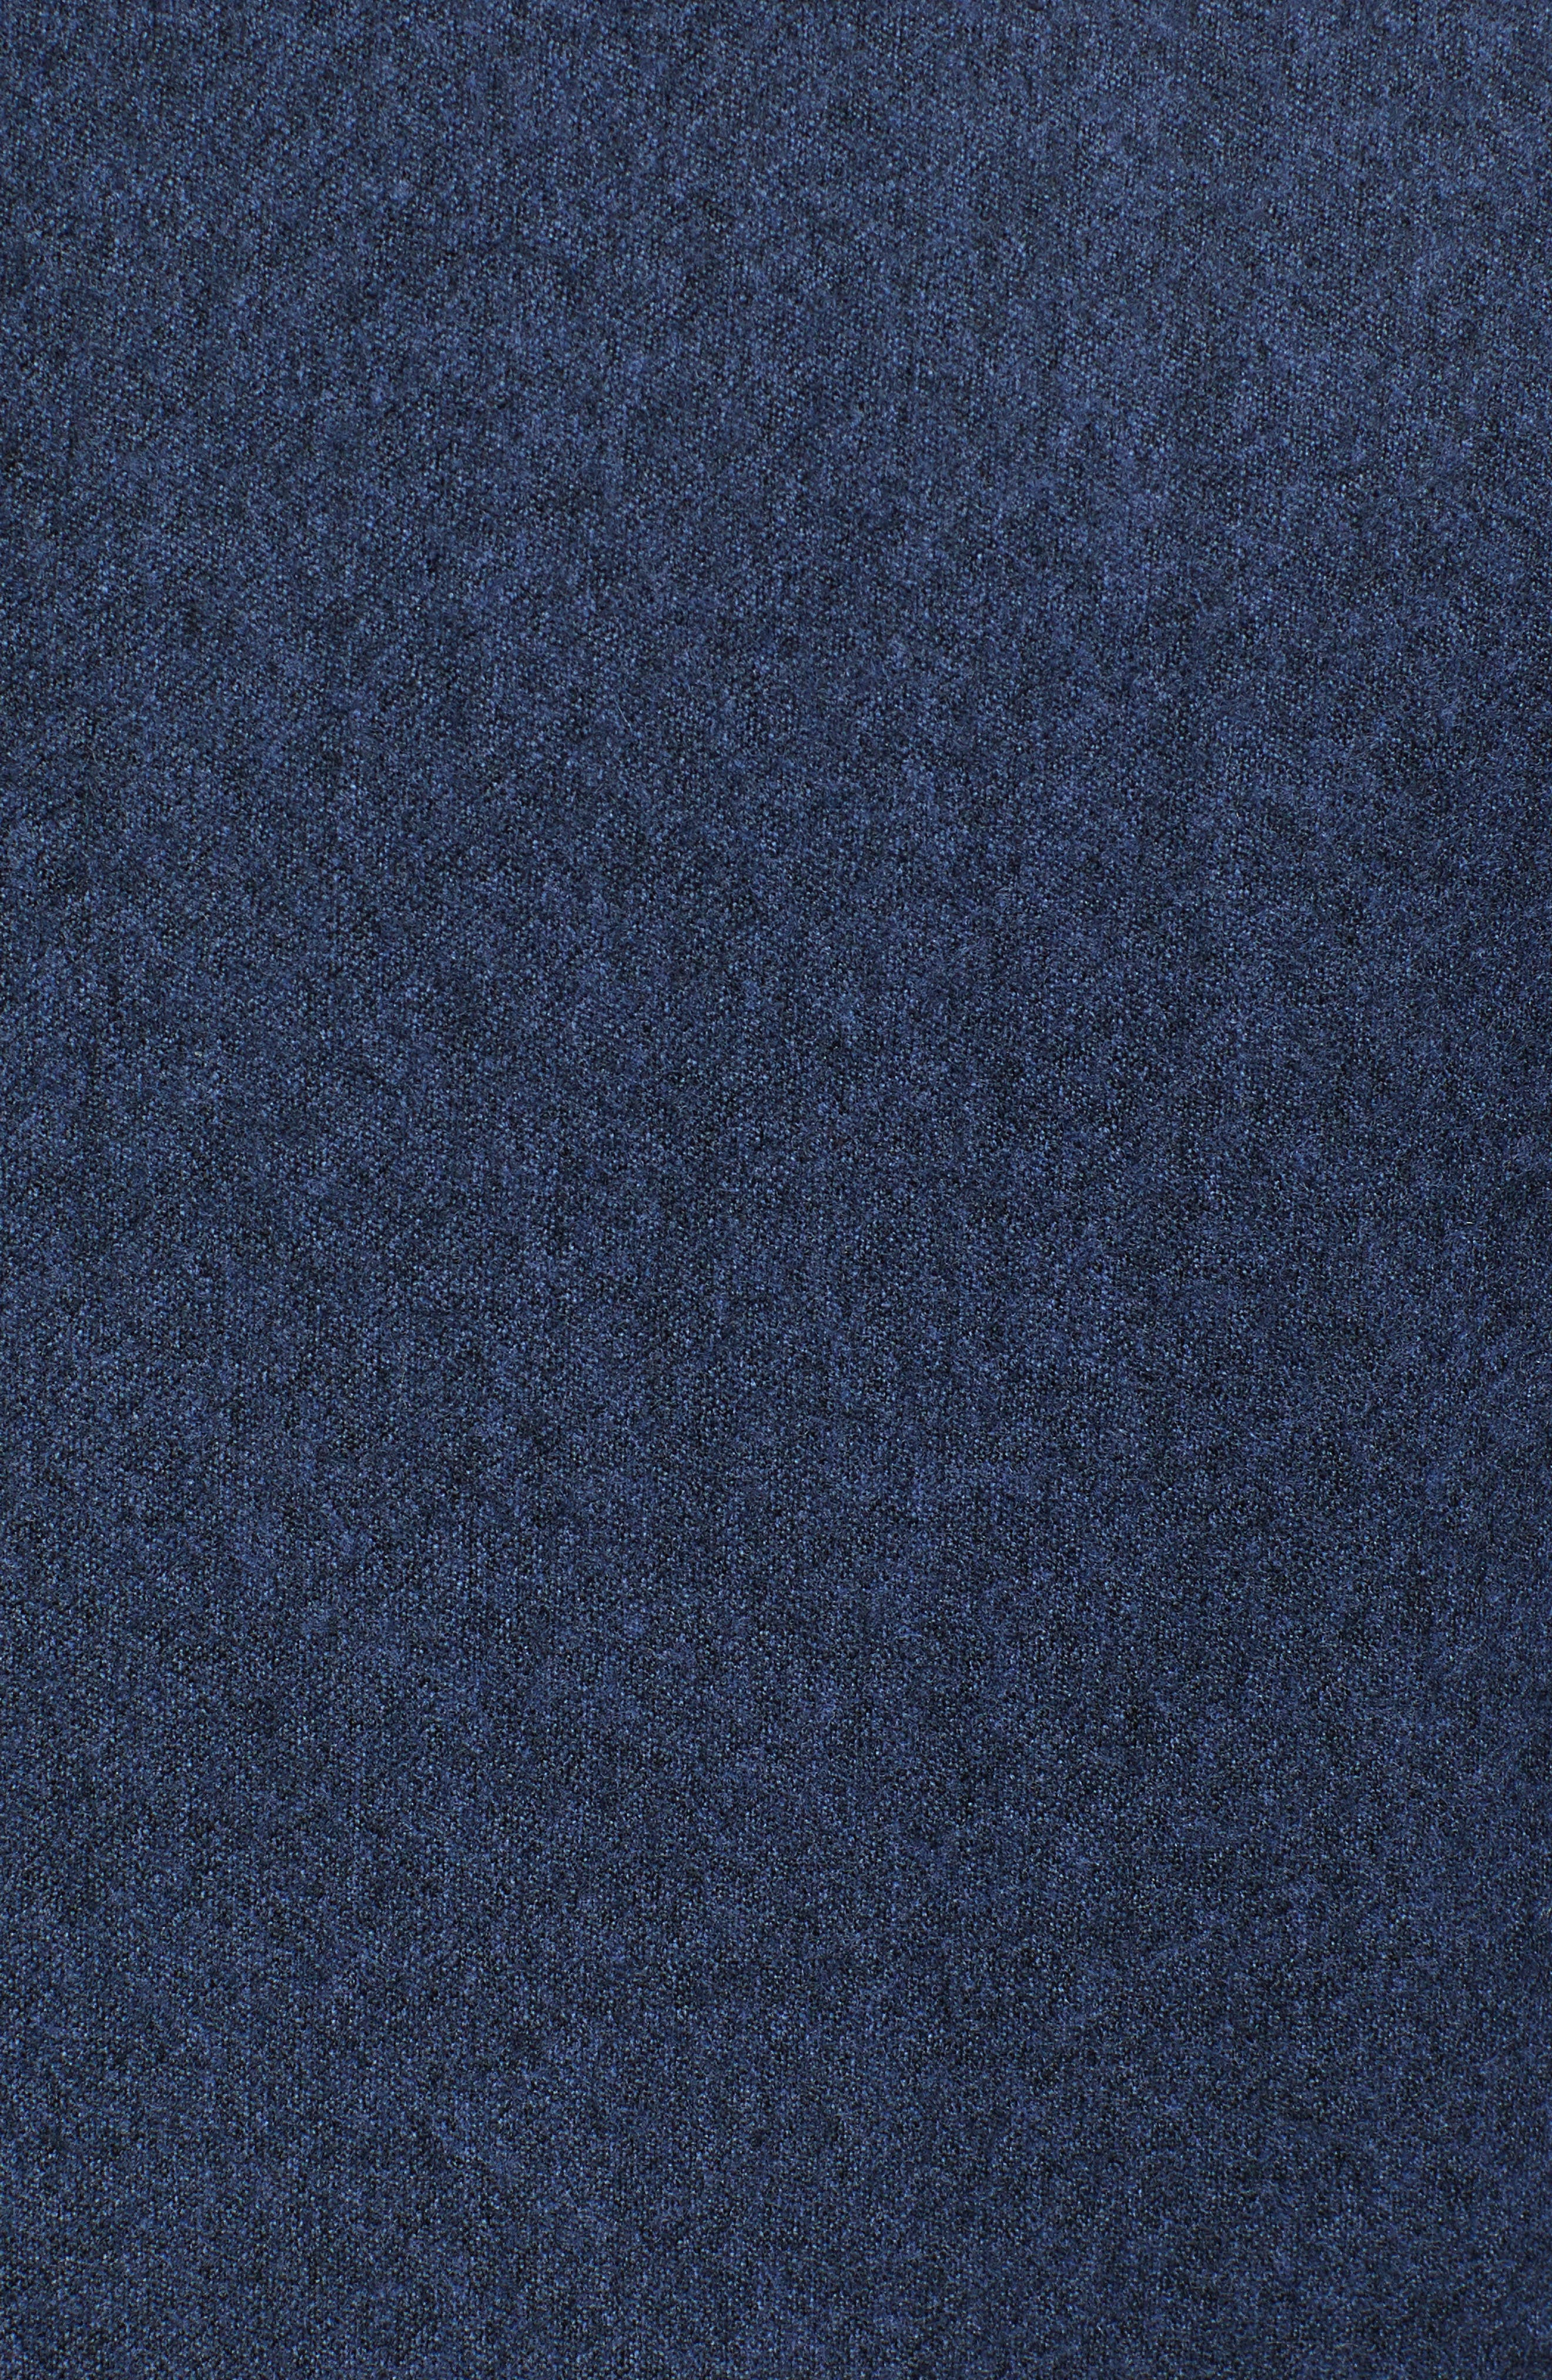 Hooper Trim Fit Wool Blazer,                             Alternate thumbnail 6, color,                             DARK BLUE